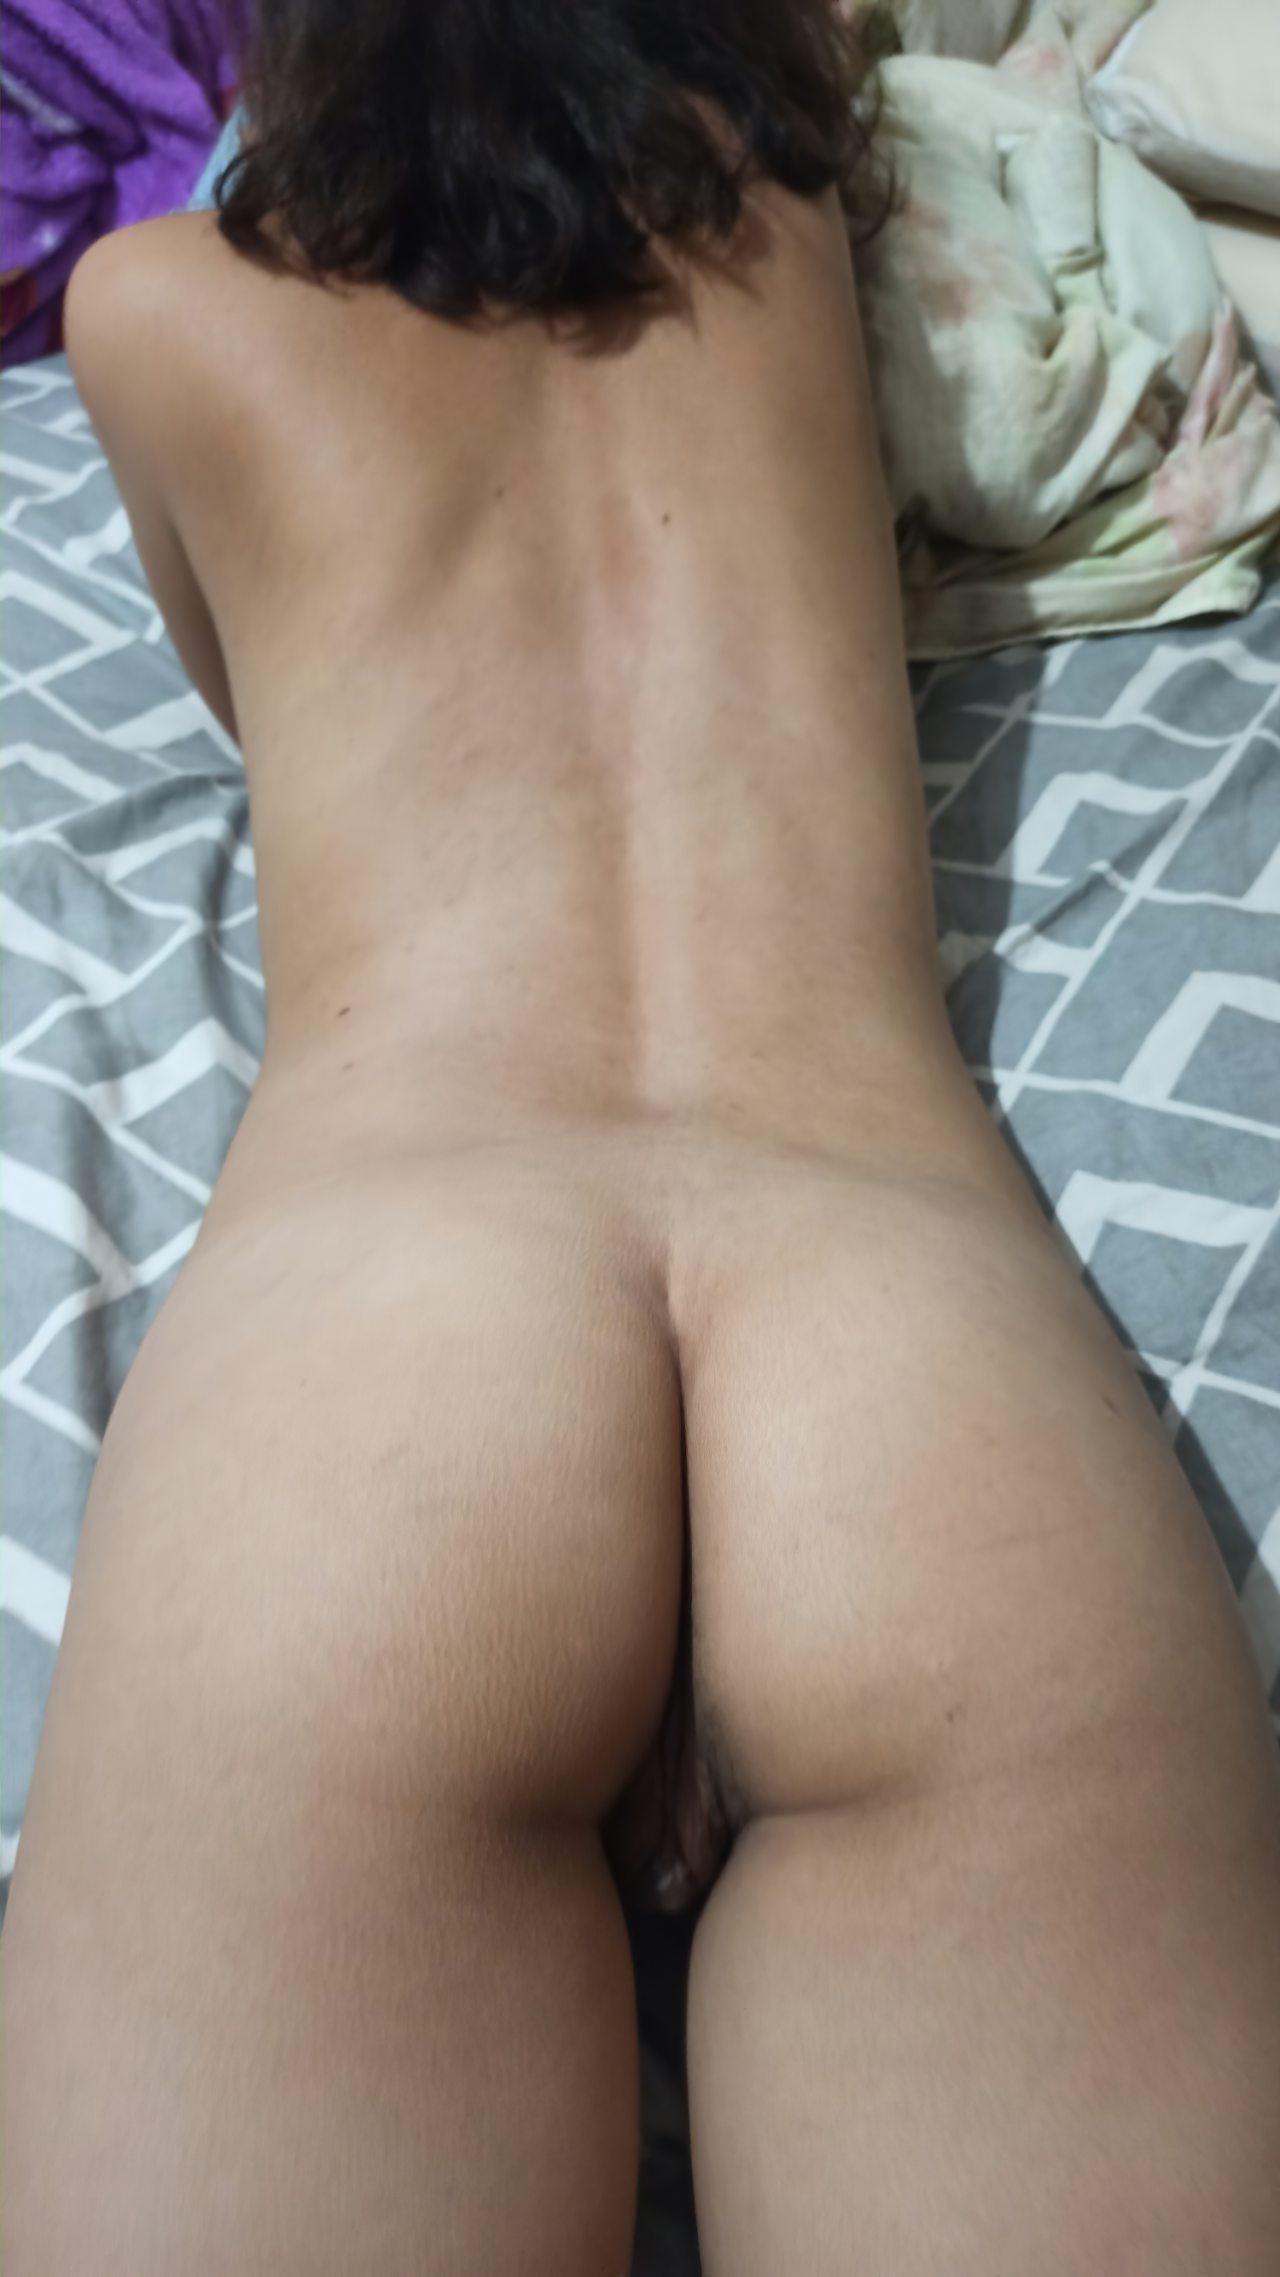 Magrinha Safada (3)